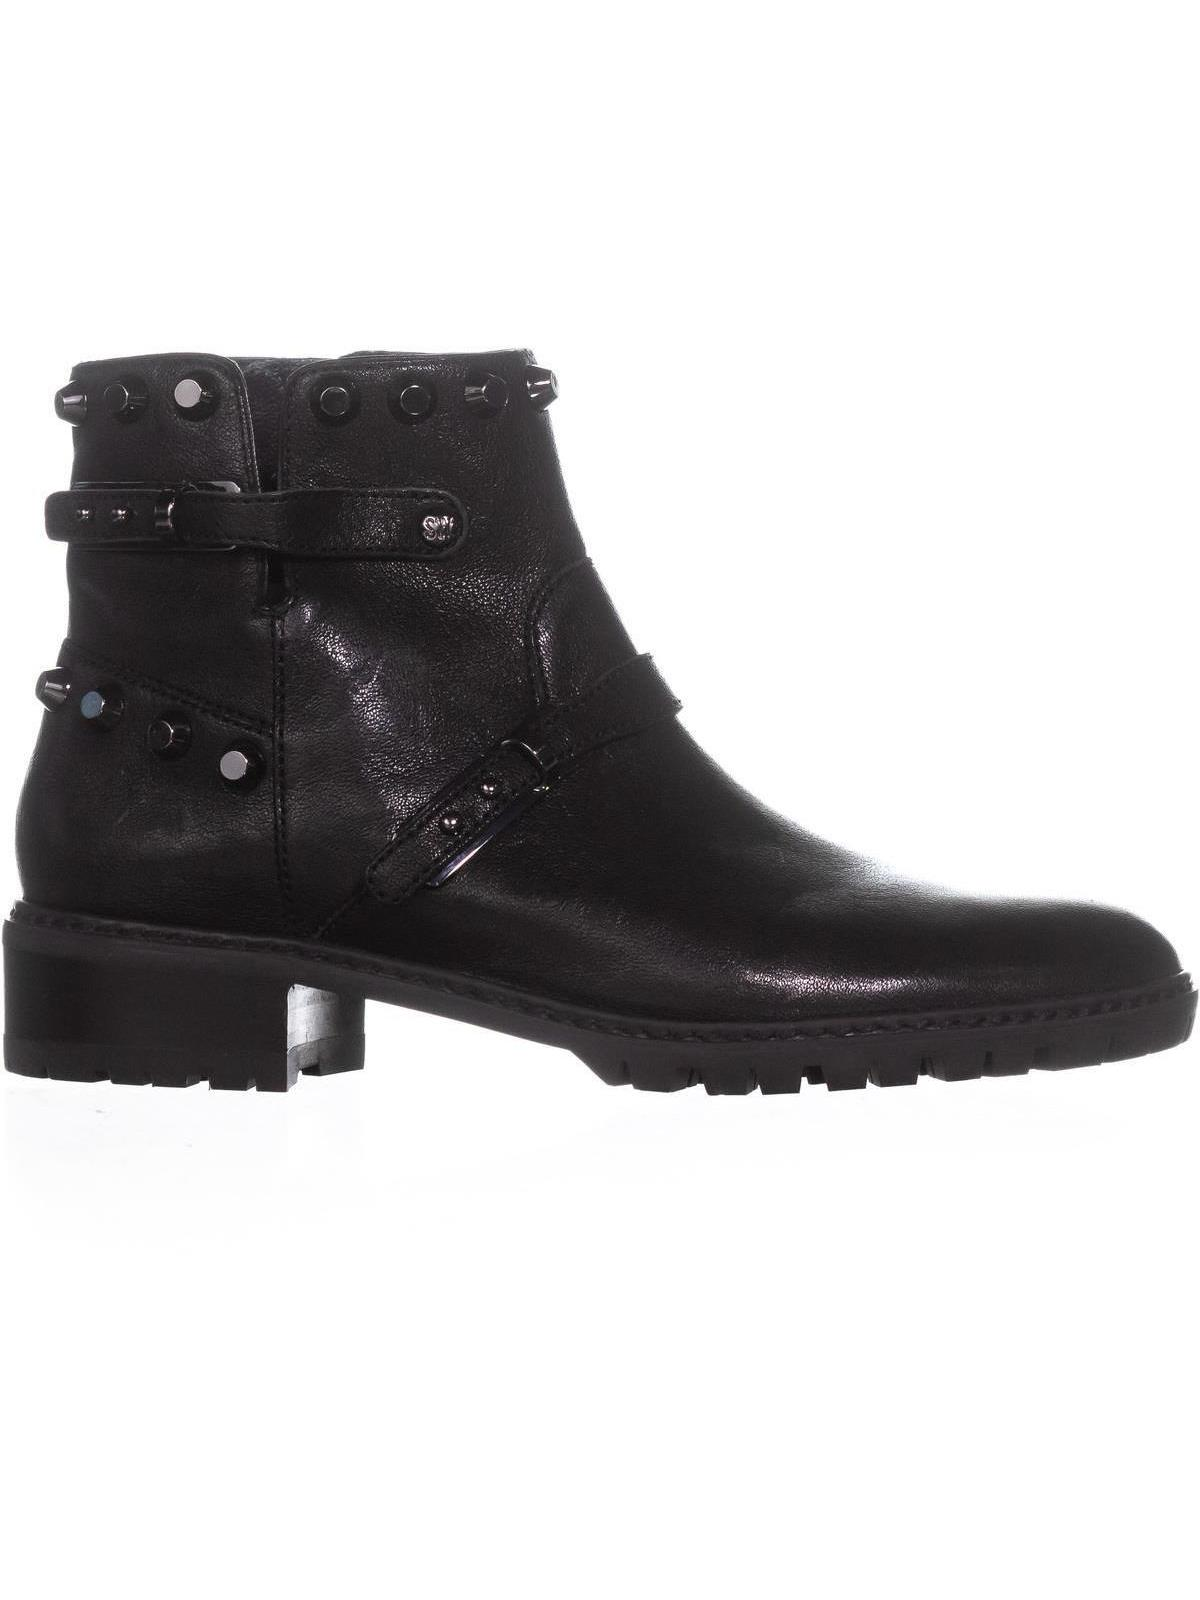 Womens Stuart Weitzman Nugowest Rhinestone Boots, Black, 7 US